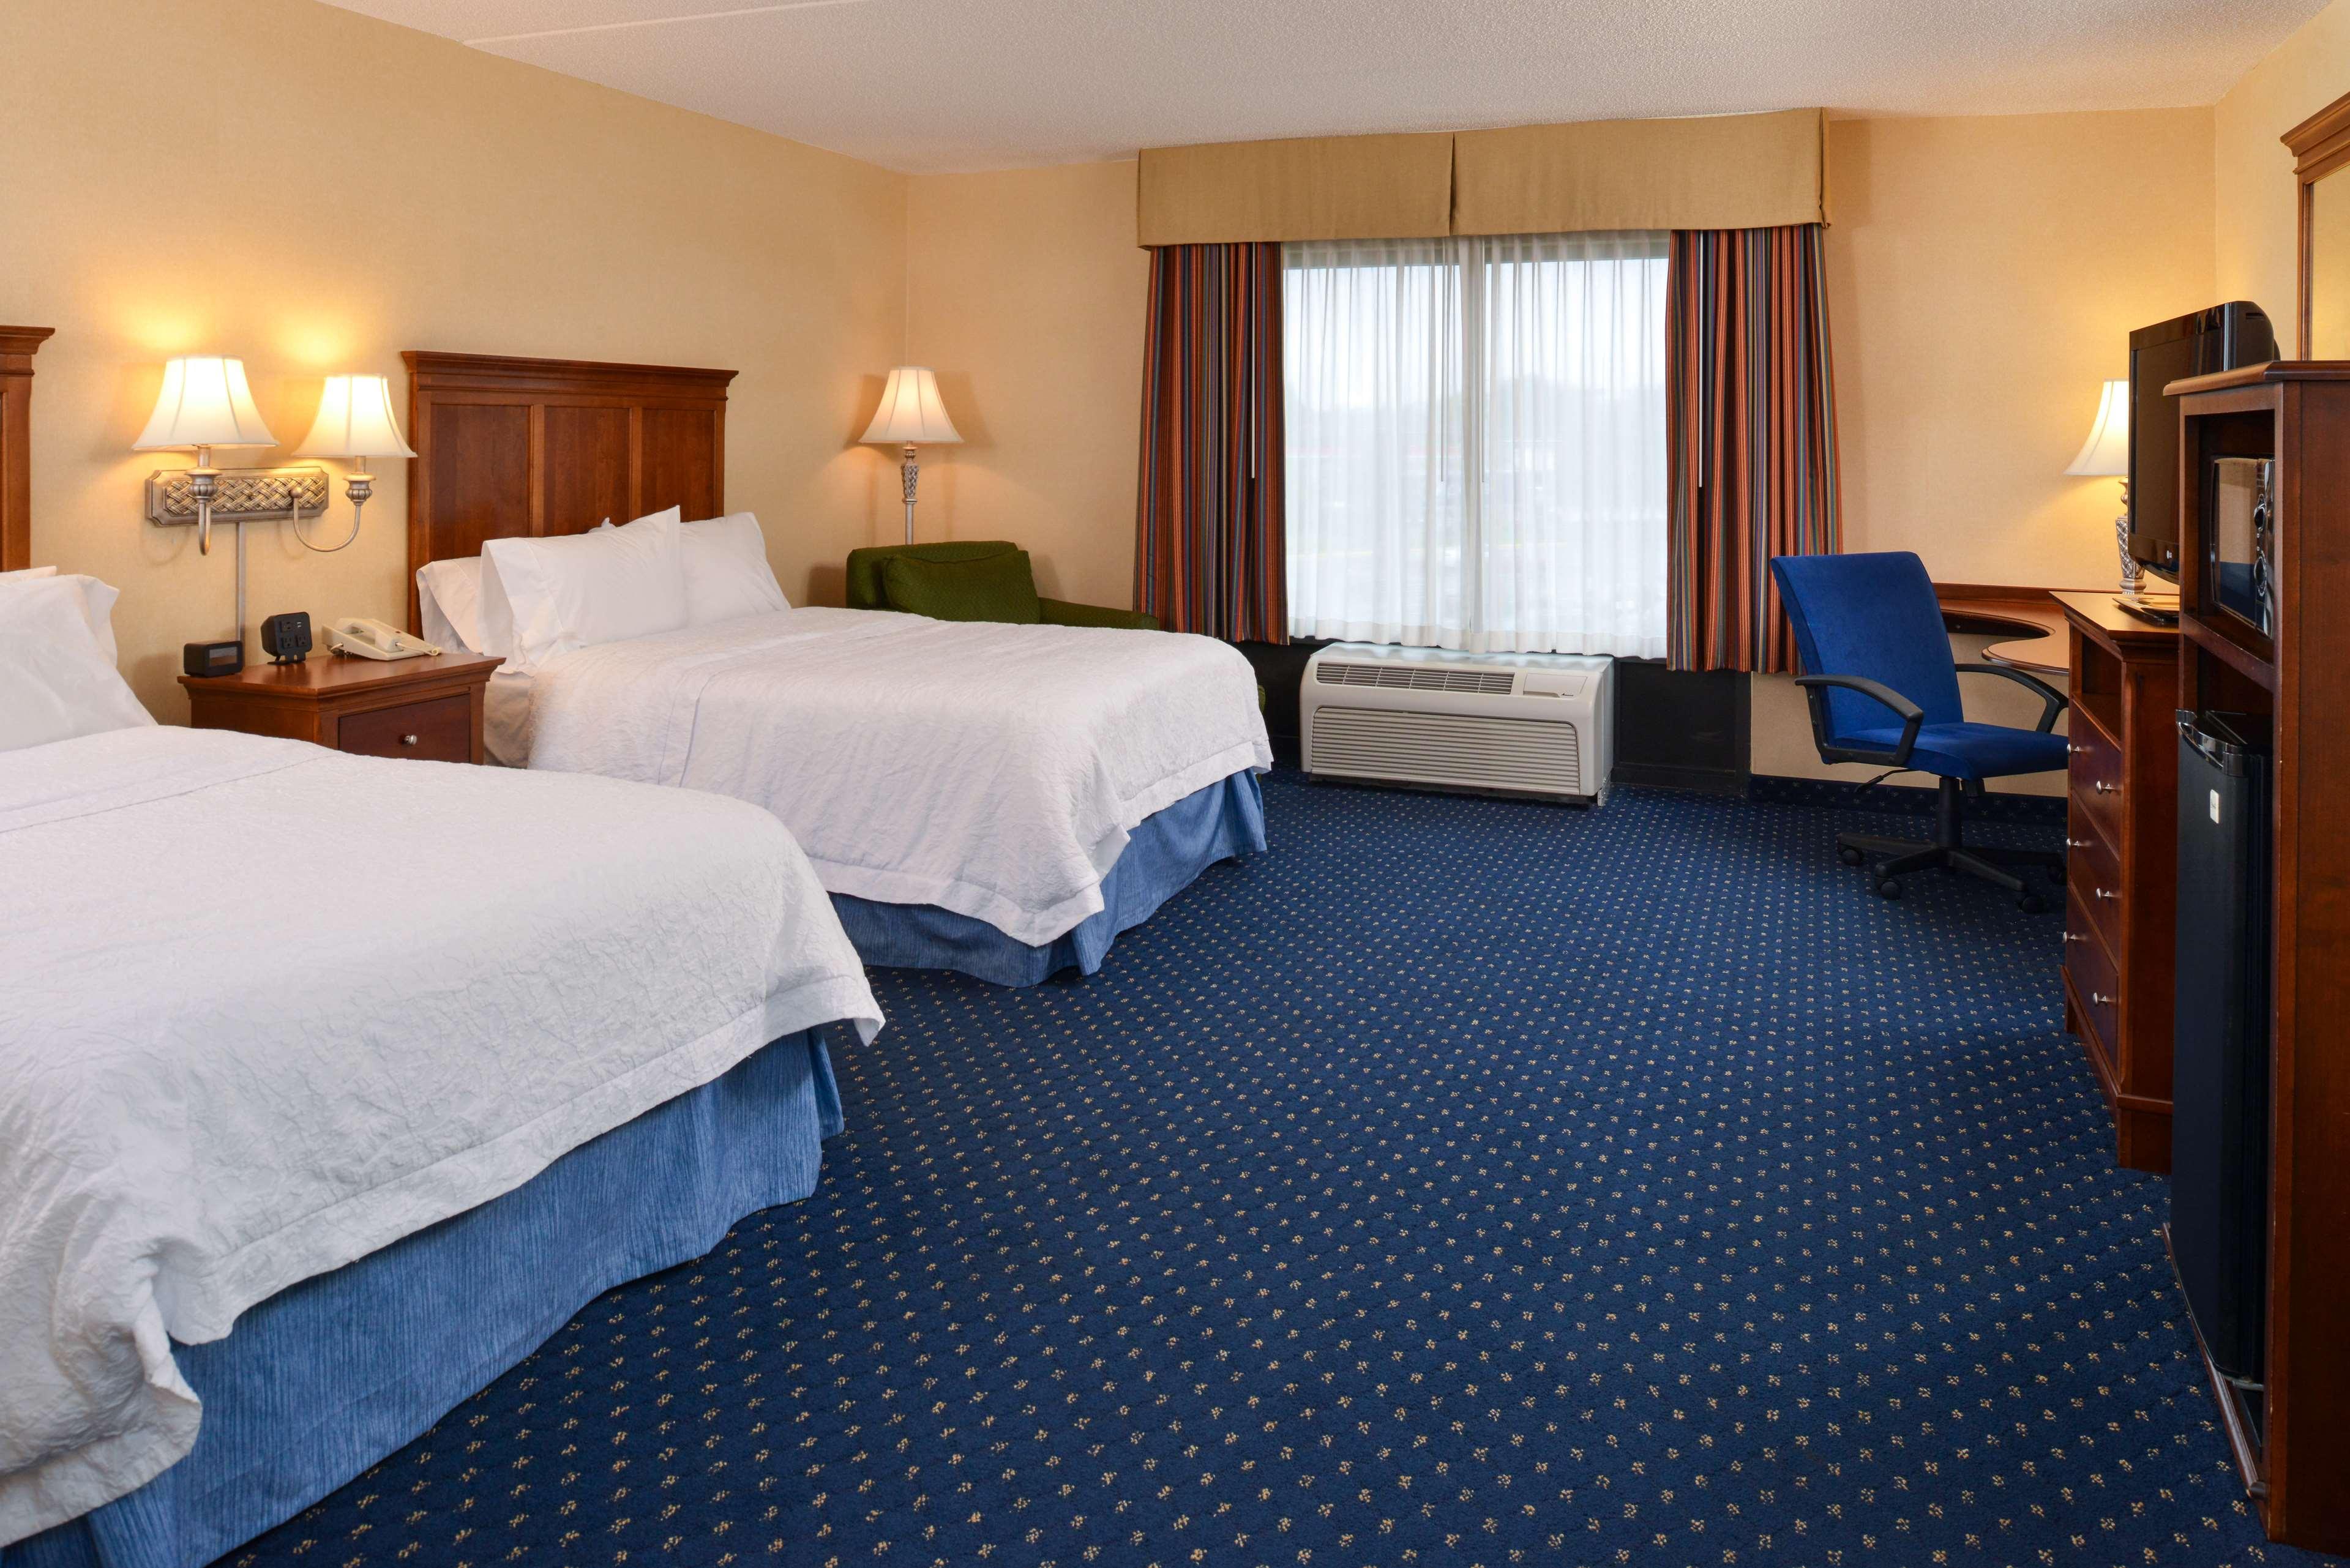 Hampton Inn & Suites Fredericksburg South image 41